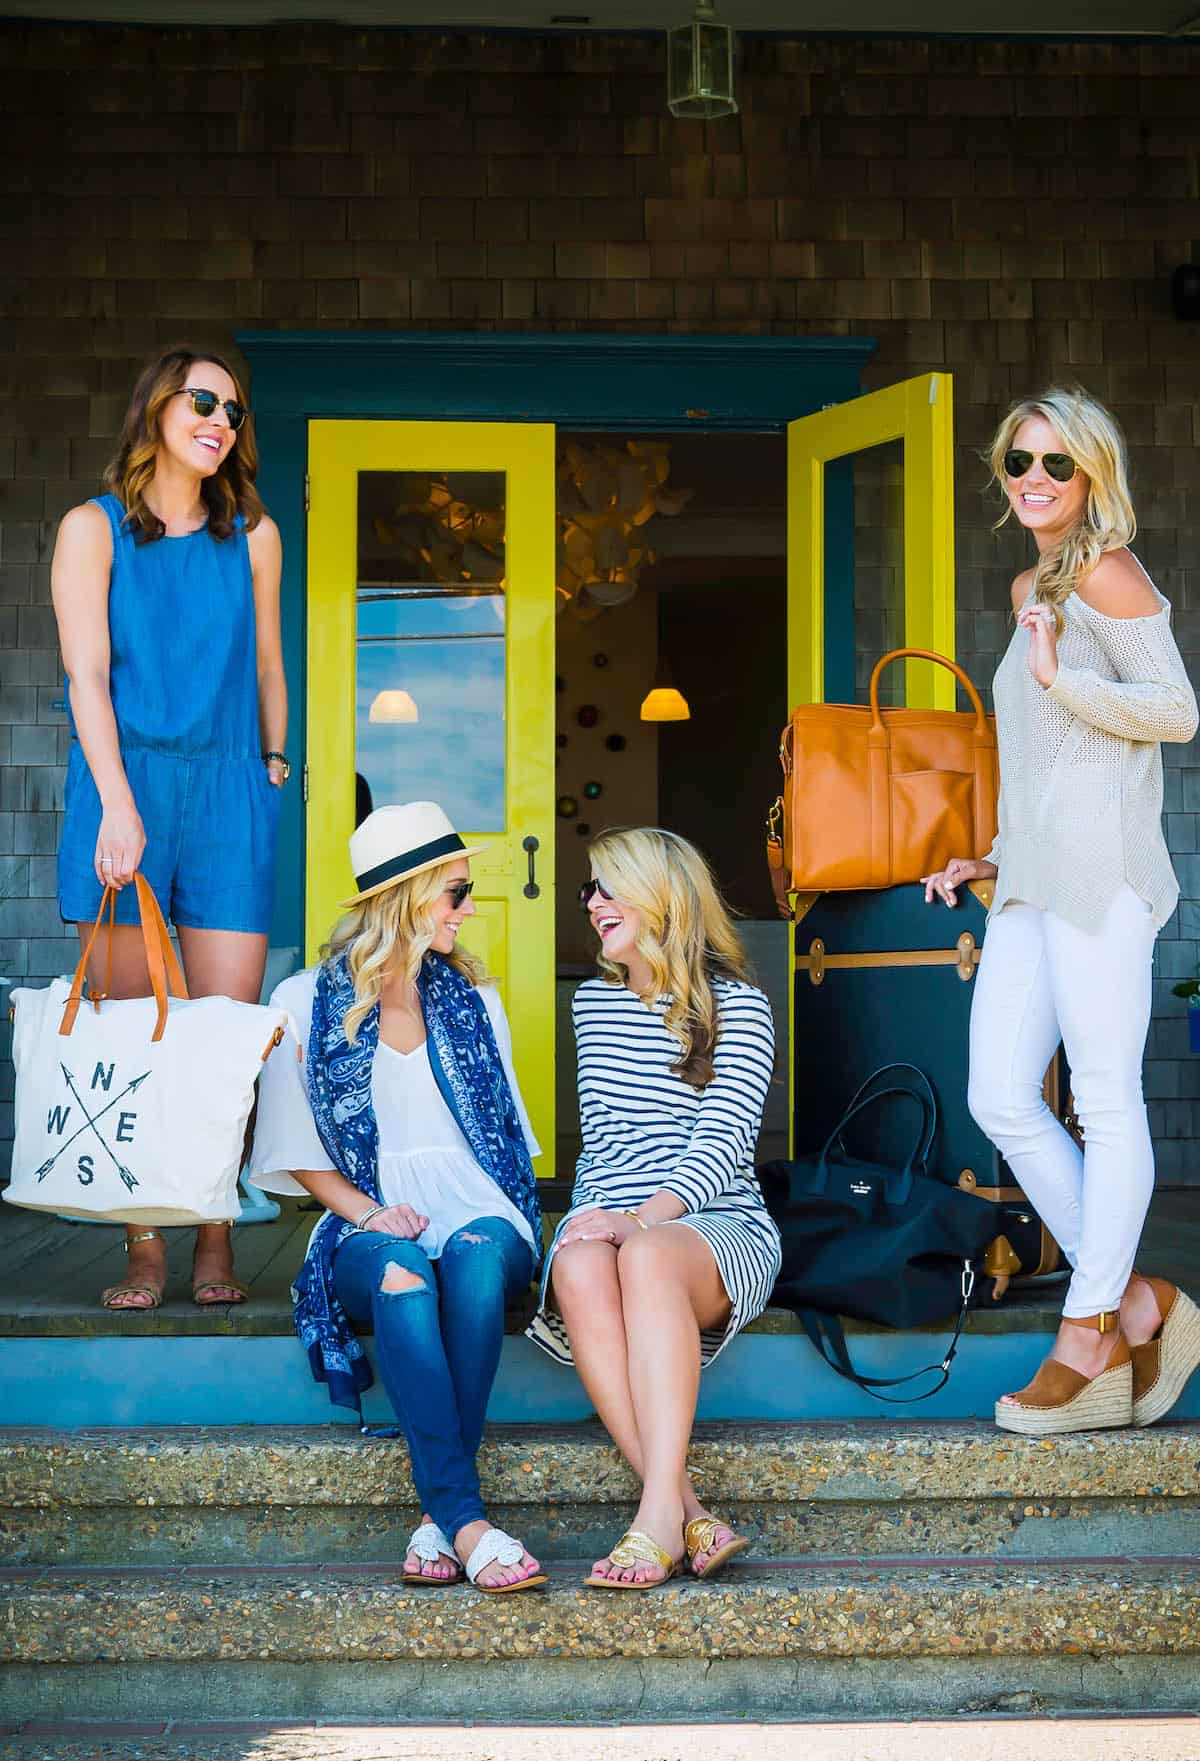 Martha's Vineyard Girls Getaway